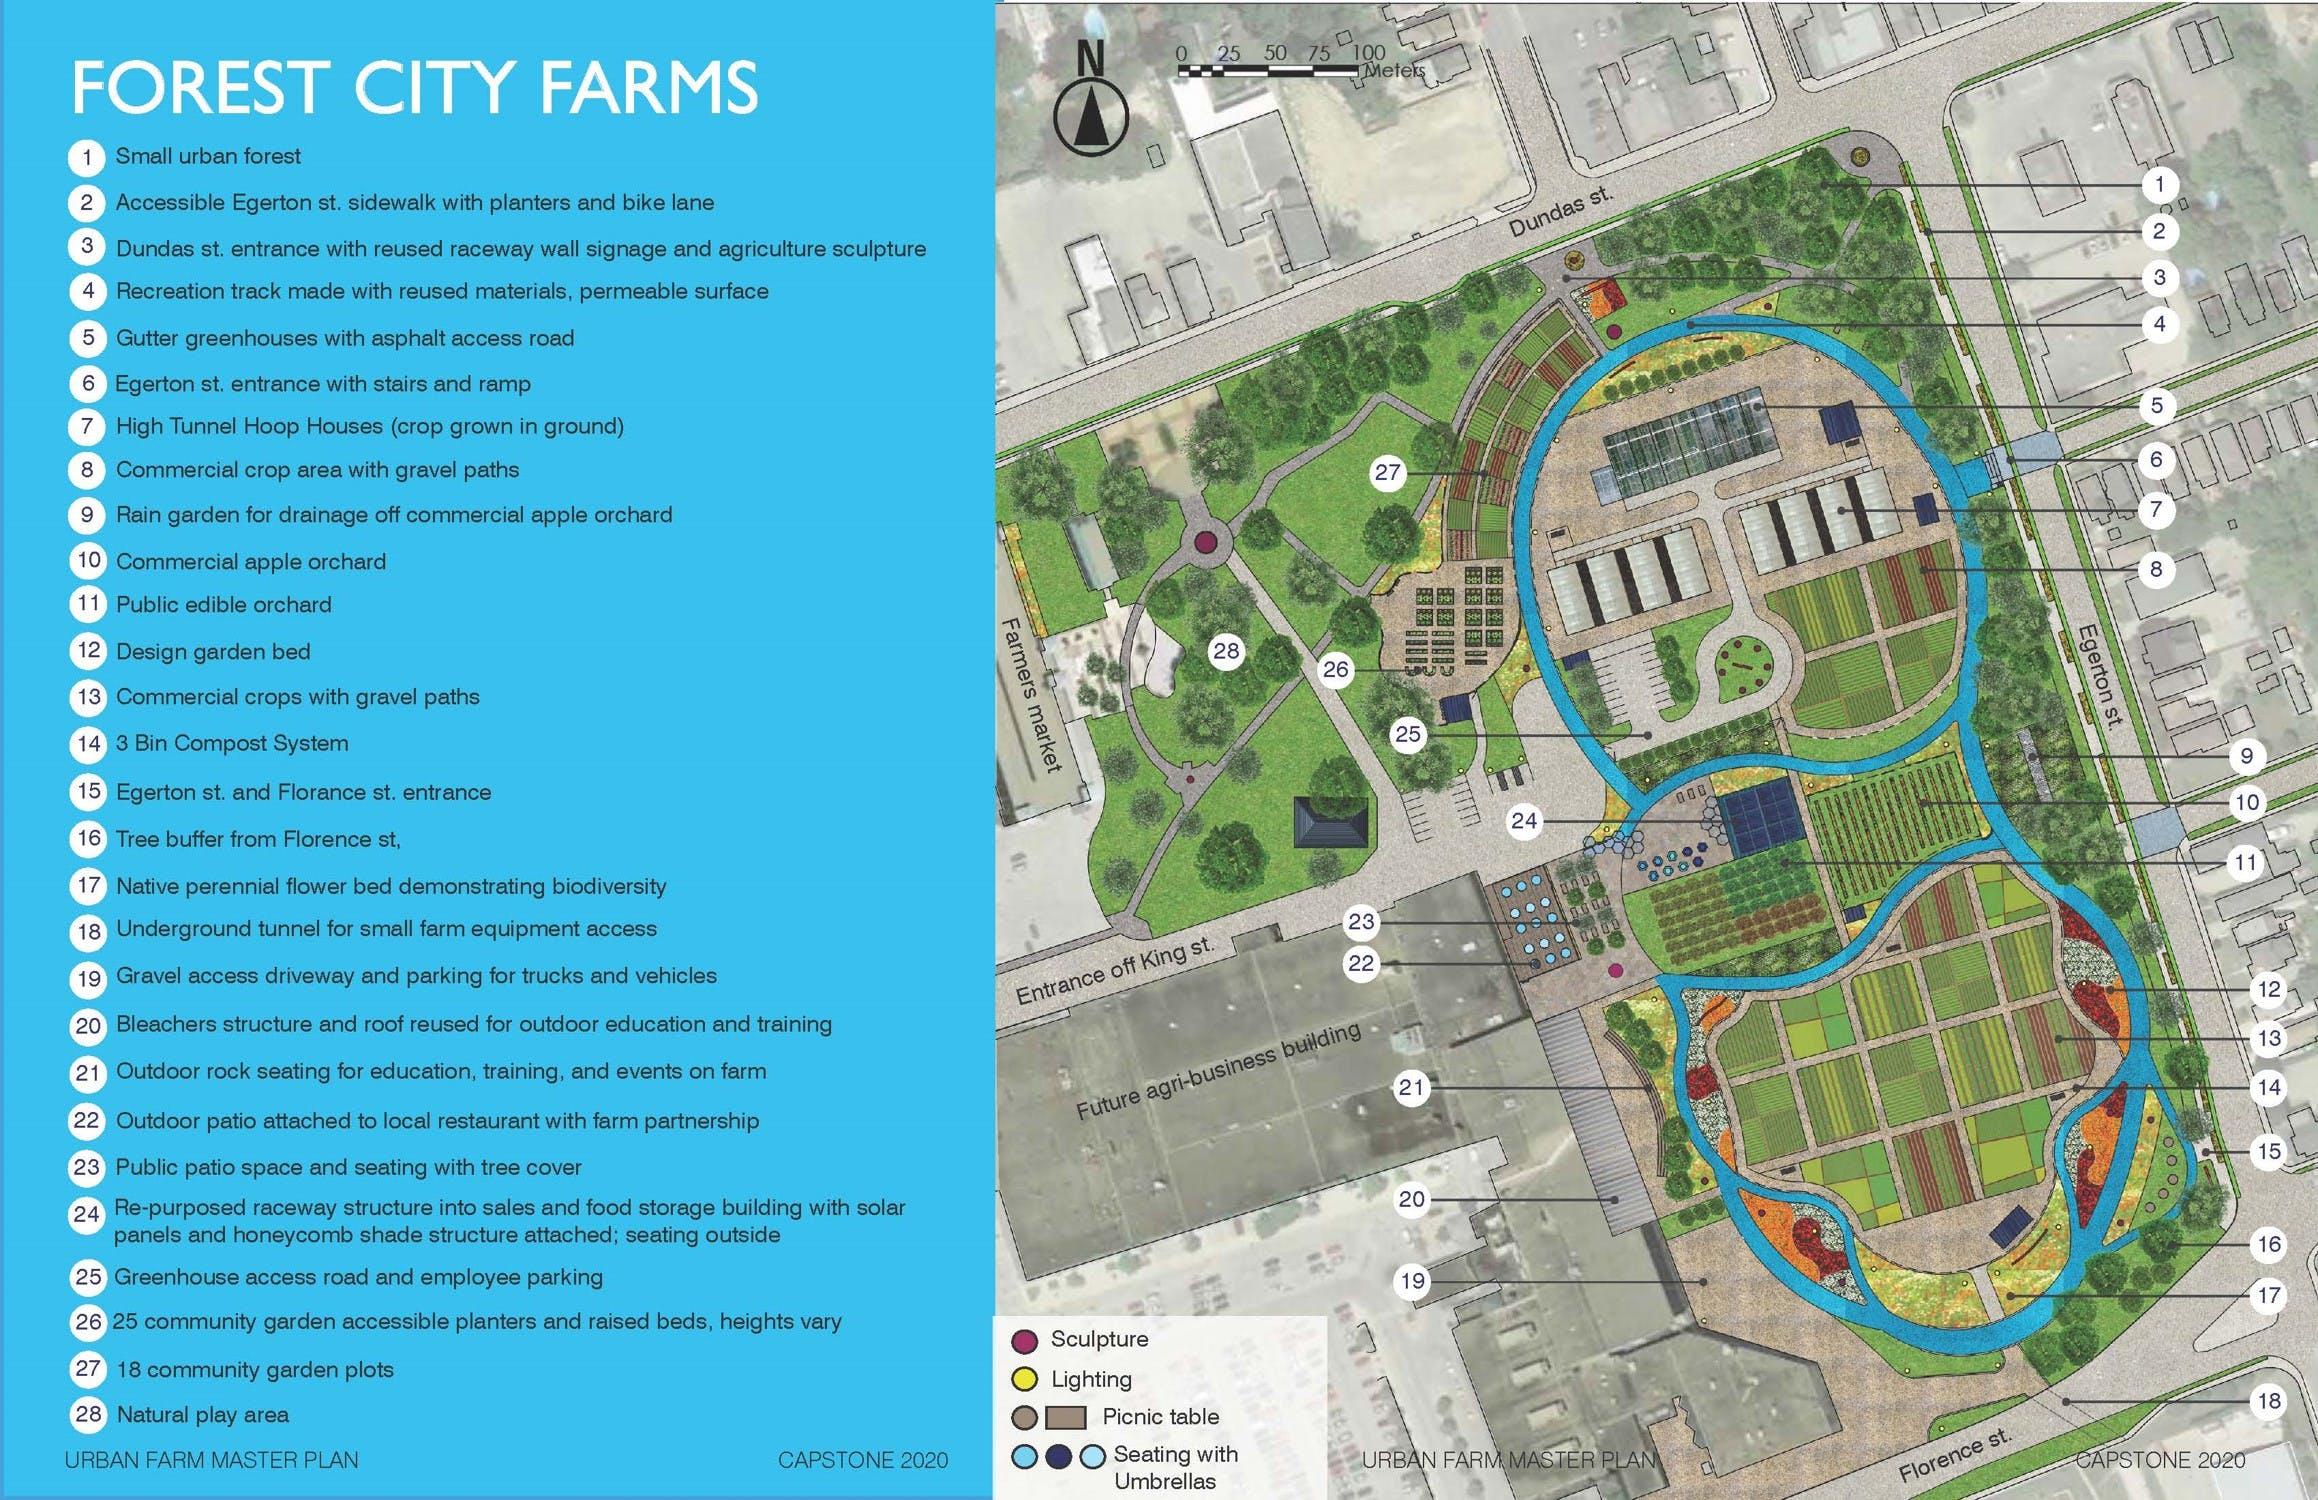 900 King Street – Forest City Farm